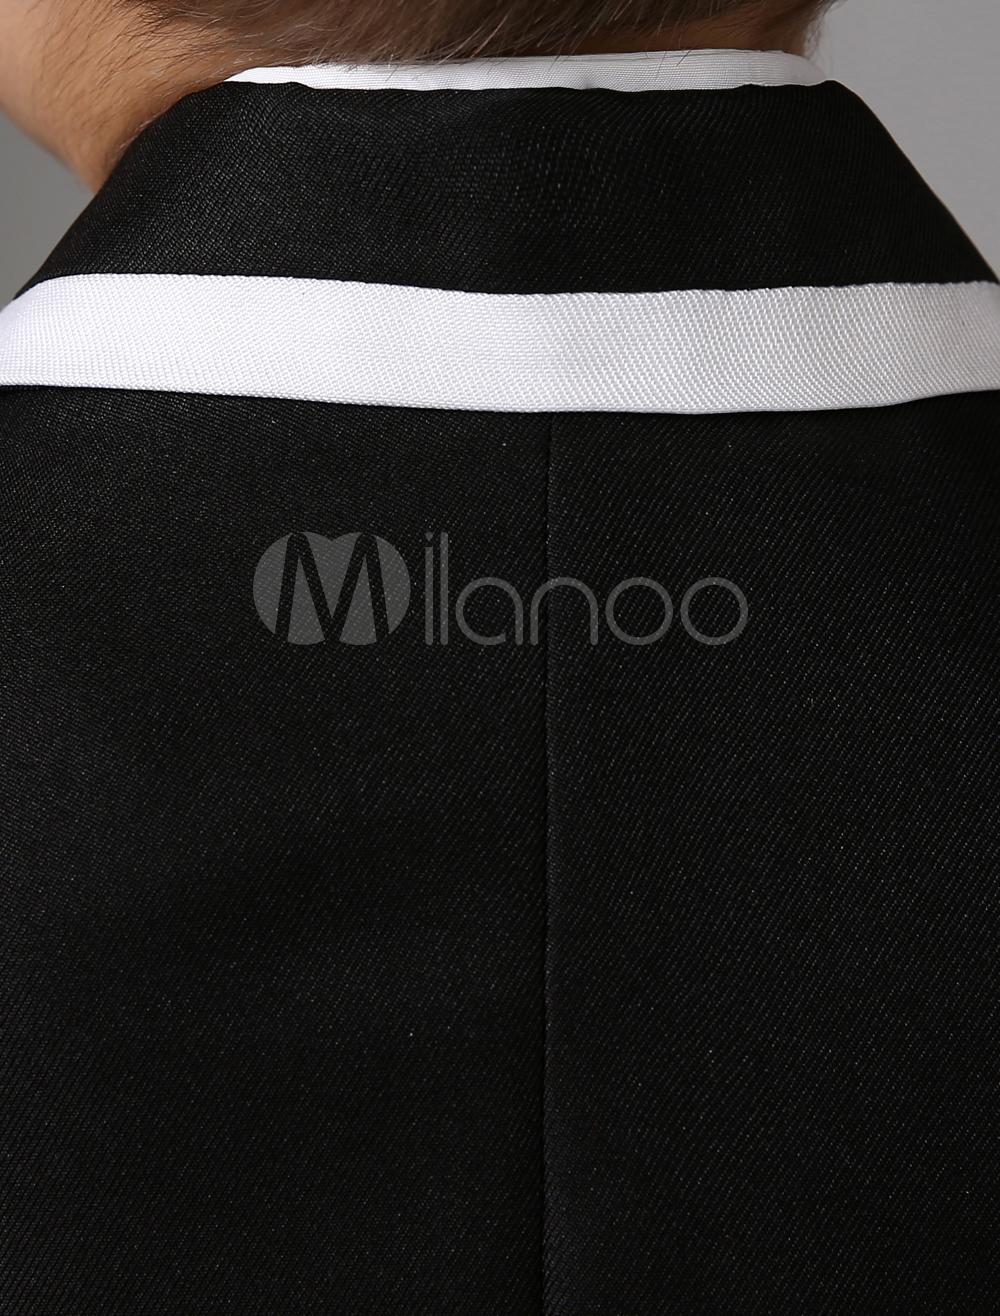 197a5b5a6 Black Boy Suit Set Kids Tuxedo Wedding Jacket Pants Shirts Bow Tie Baby Boy  Suit 4 Pcs Ring Bearer Suits #Tuxedo, #Kids, #Jacket